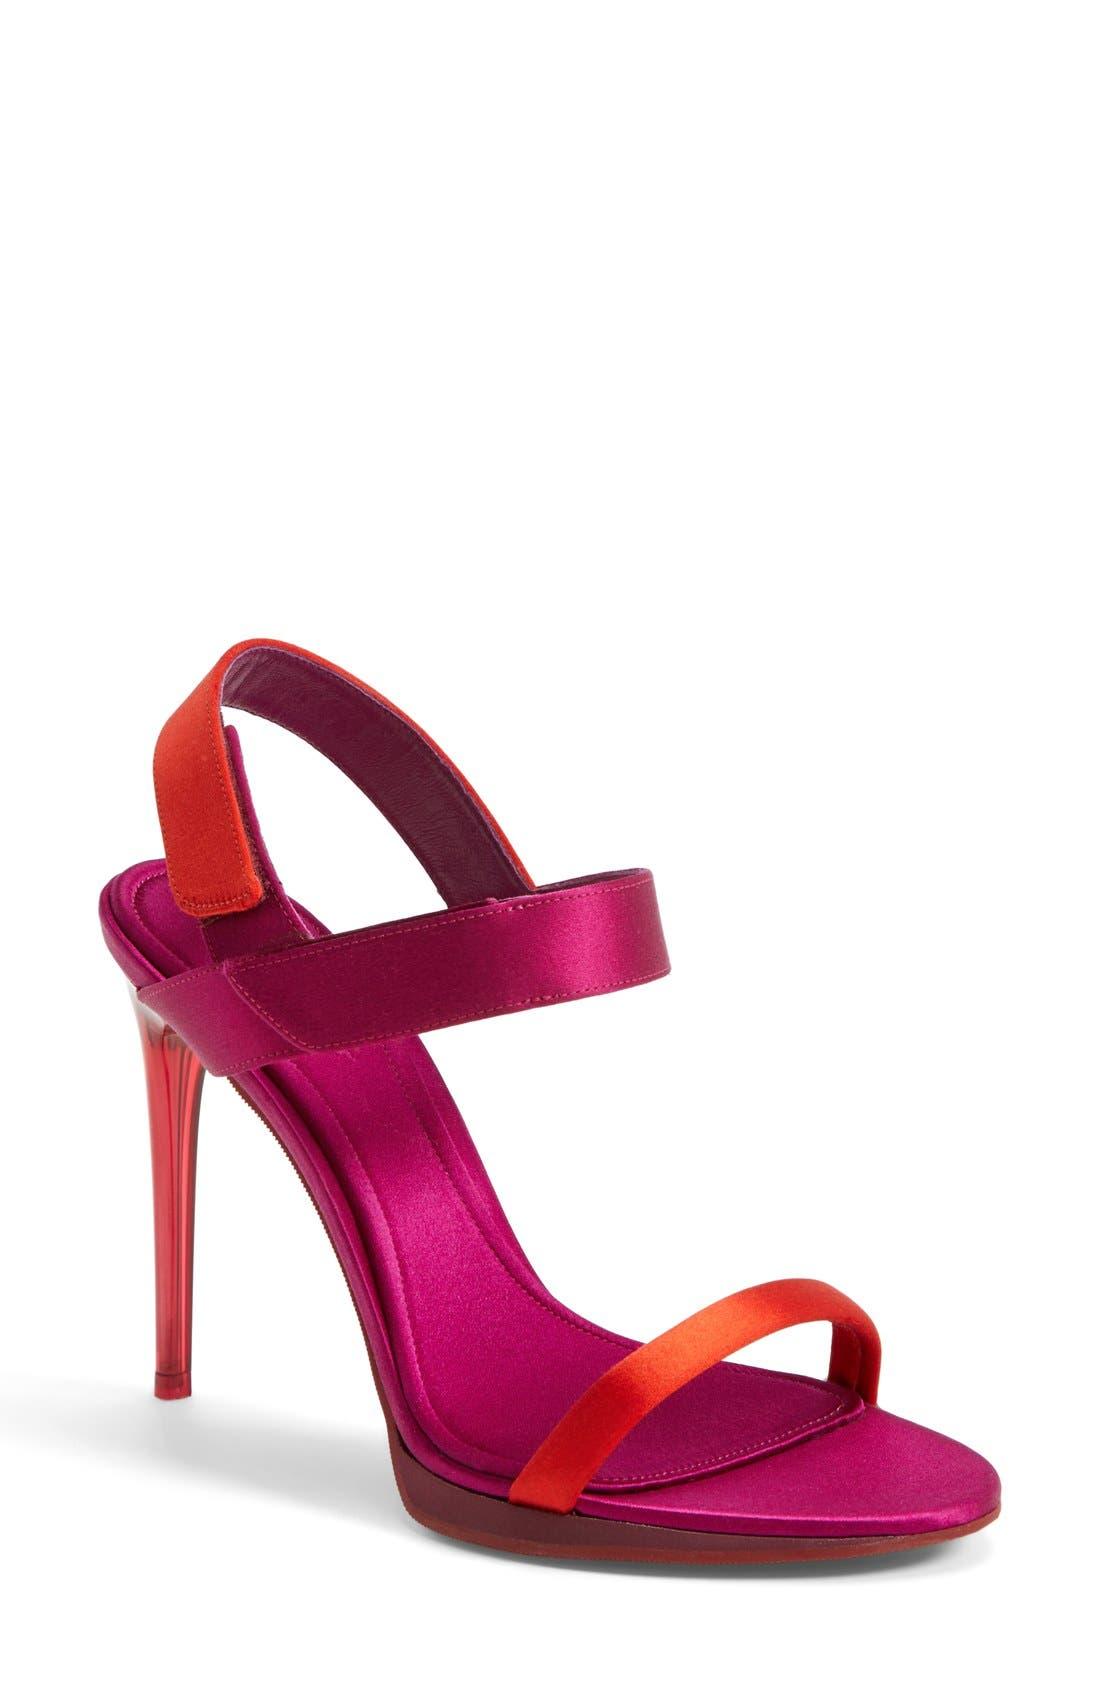 Alternate Image 1 Selected - Burberry 'Calcoat' Sandal (Women)